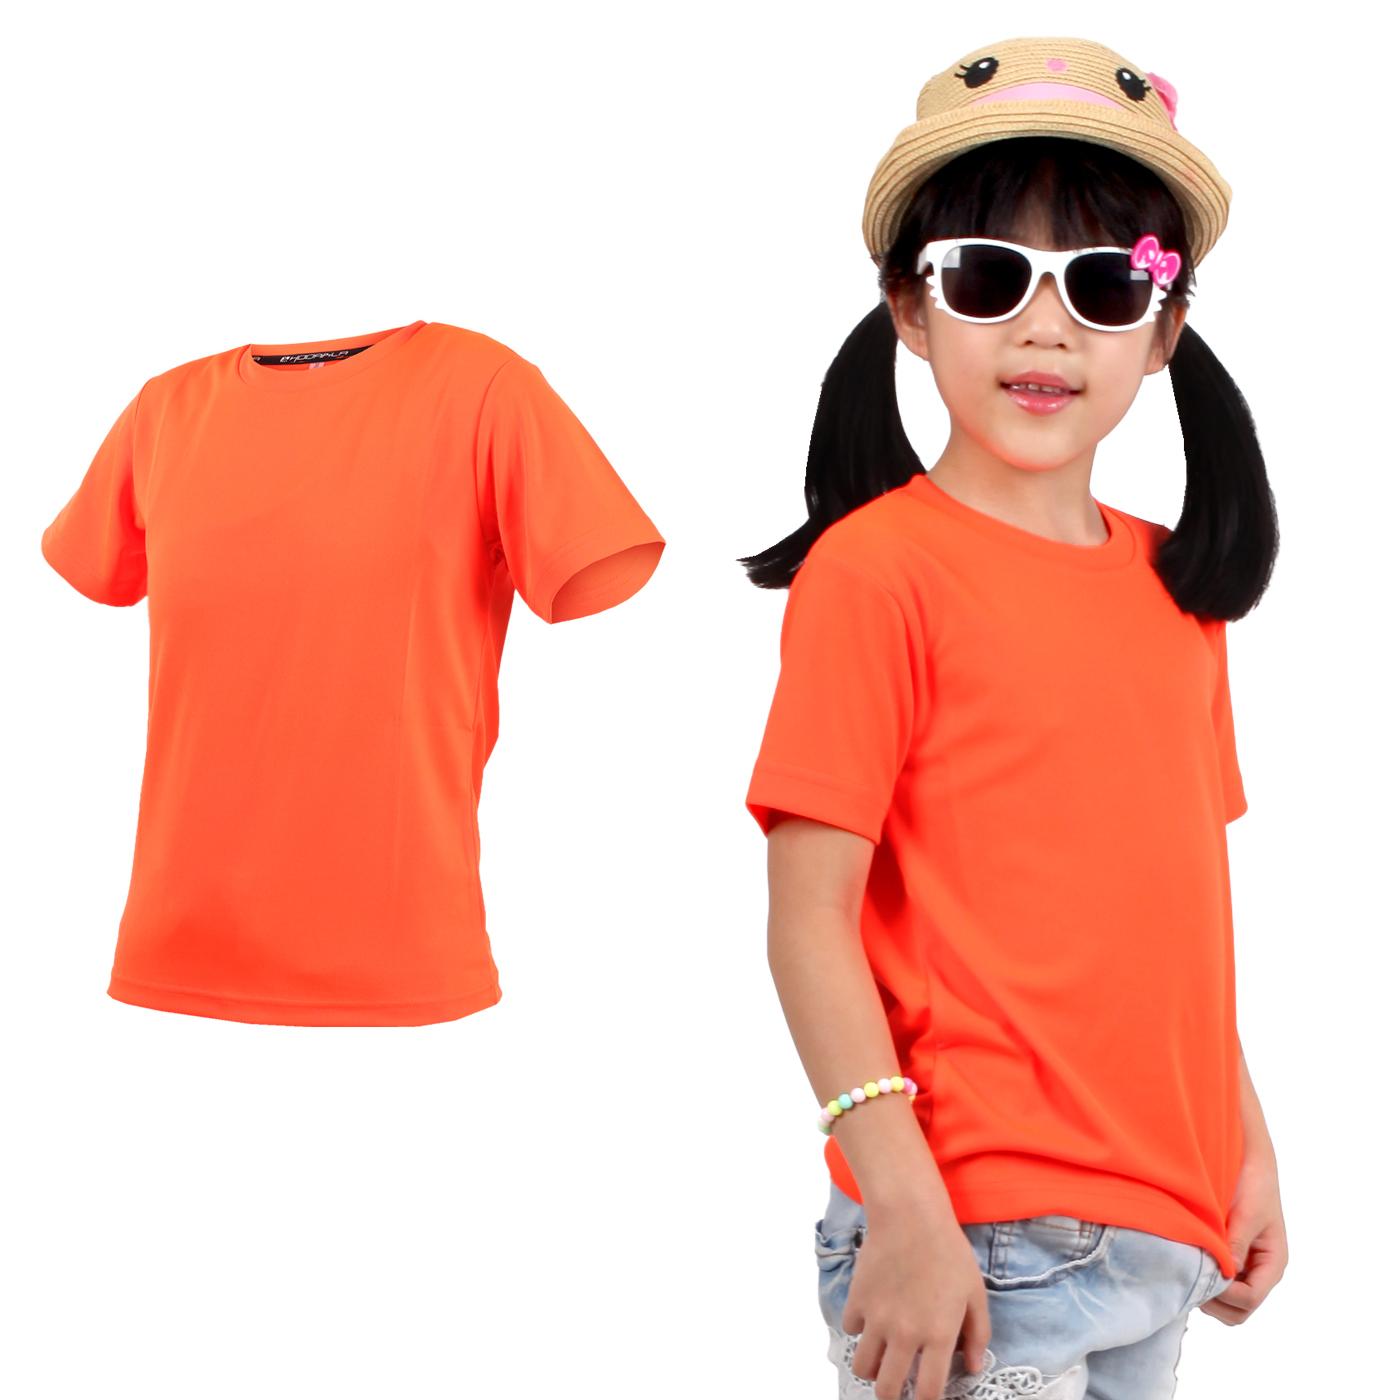 HODARLA 童裝FLARE 100 吸濕排汗衫 3135902 - 螢光橘